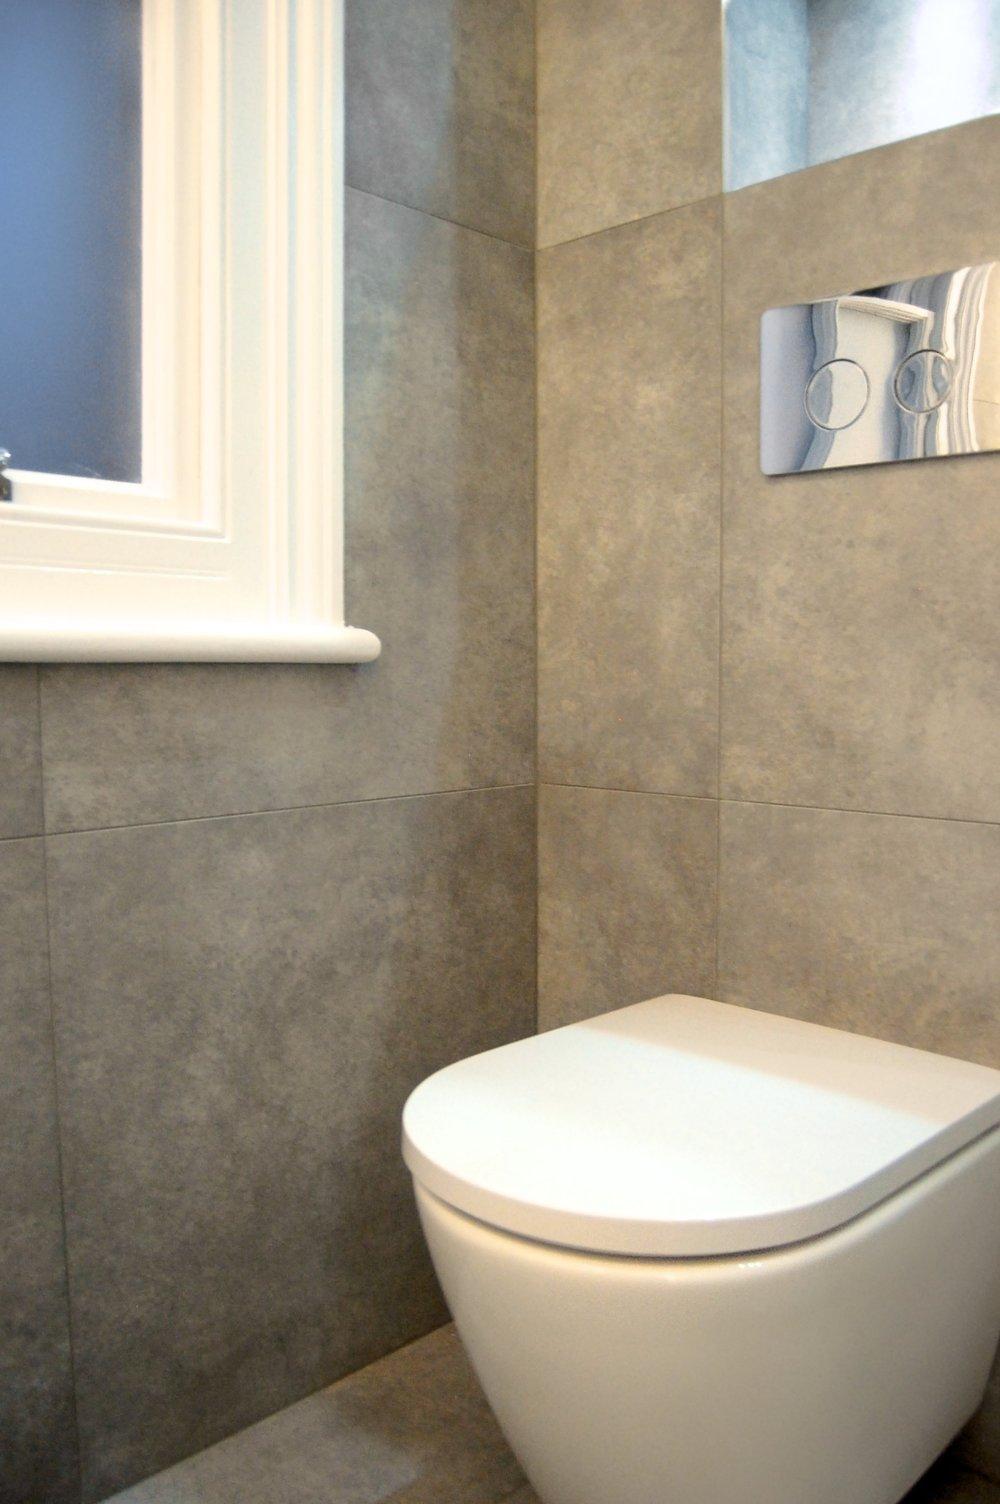 Retreat Bathrooms Bathroom Design, Refurbishment, Supply & Installation Teddington, Richmond 759.jpg